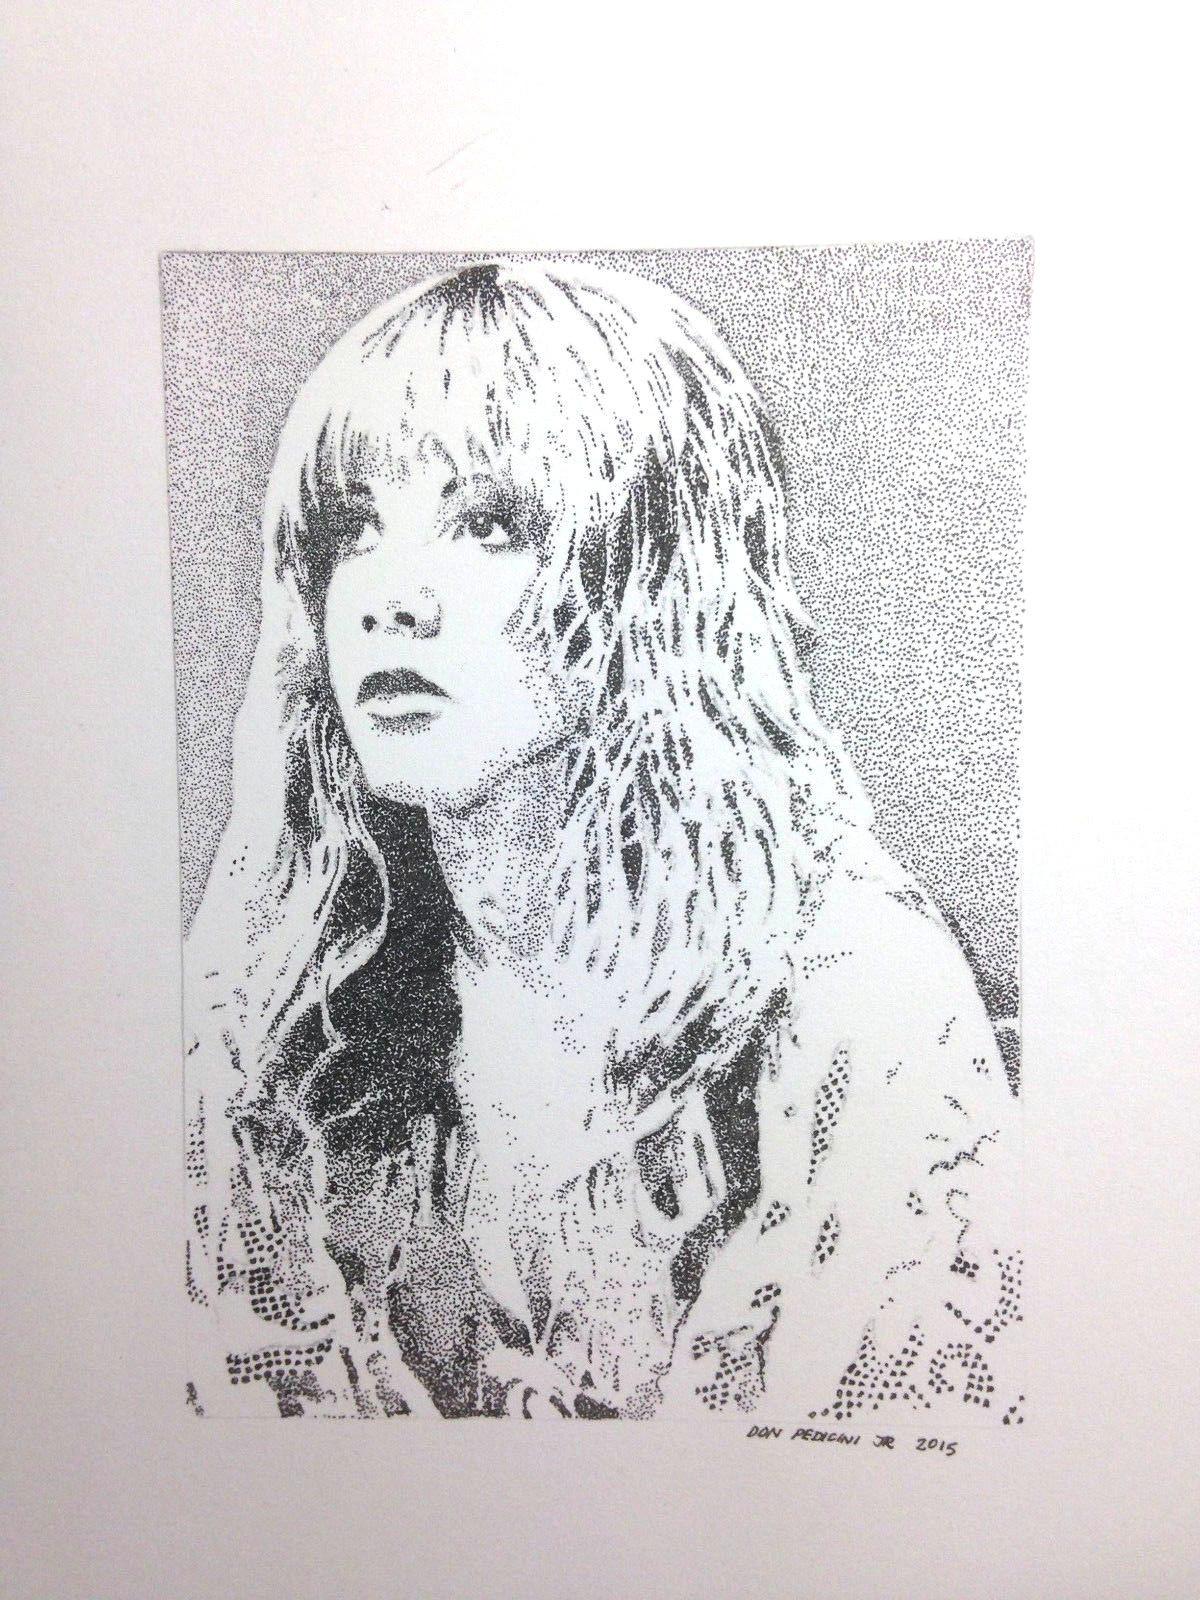 original pen and ink artwork created in stipple